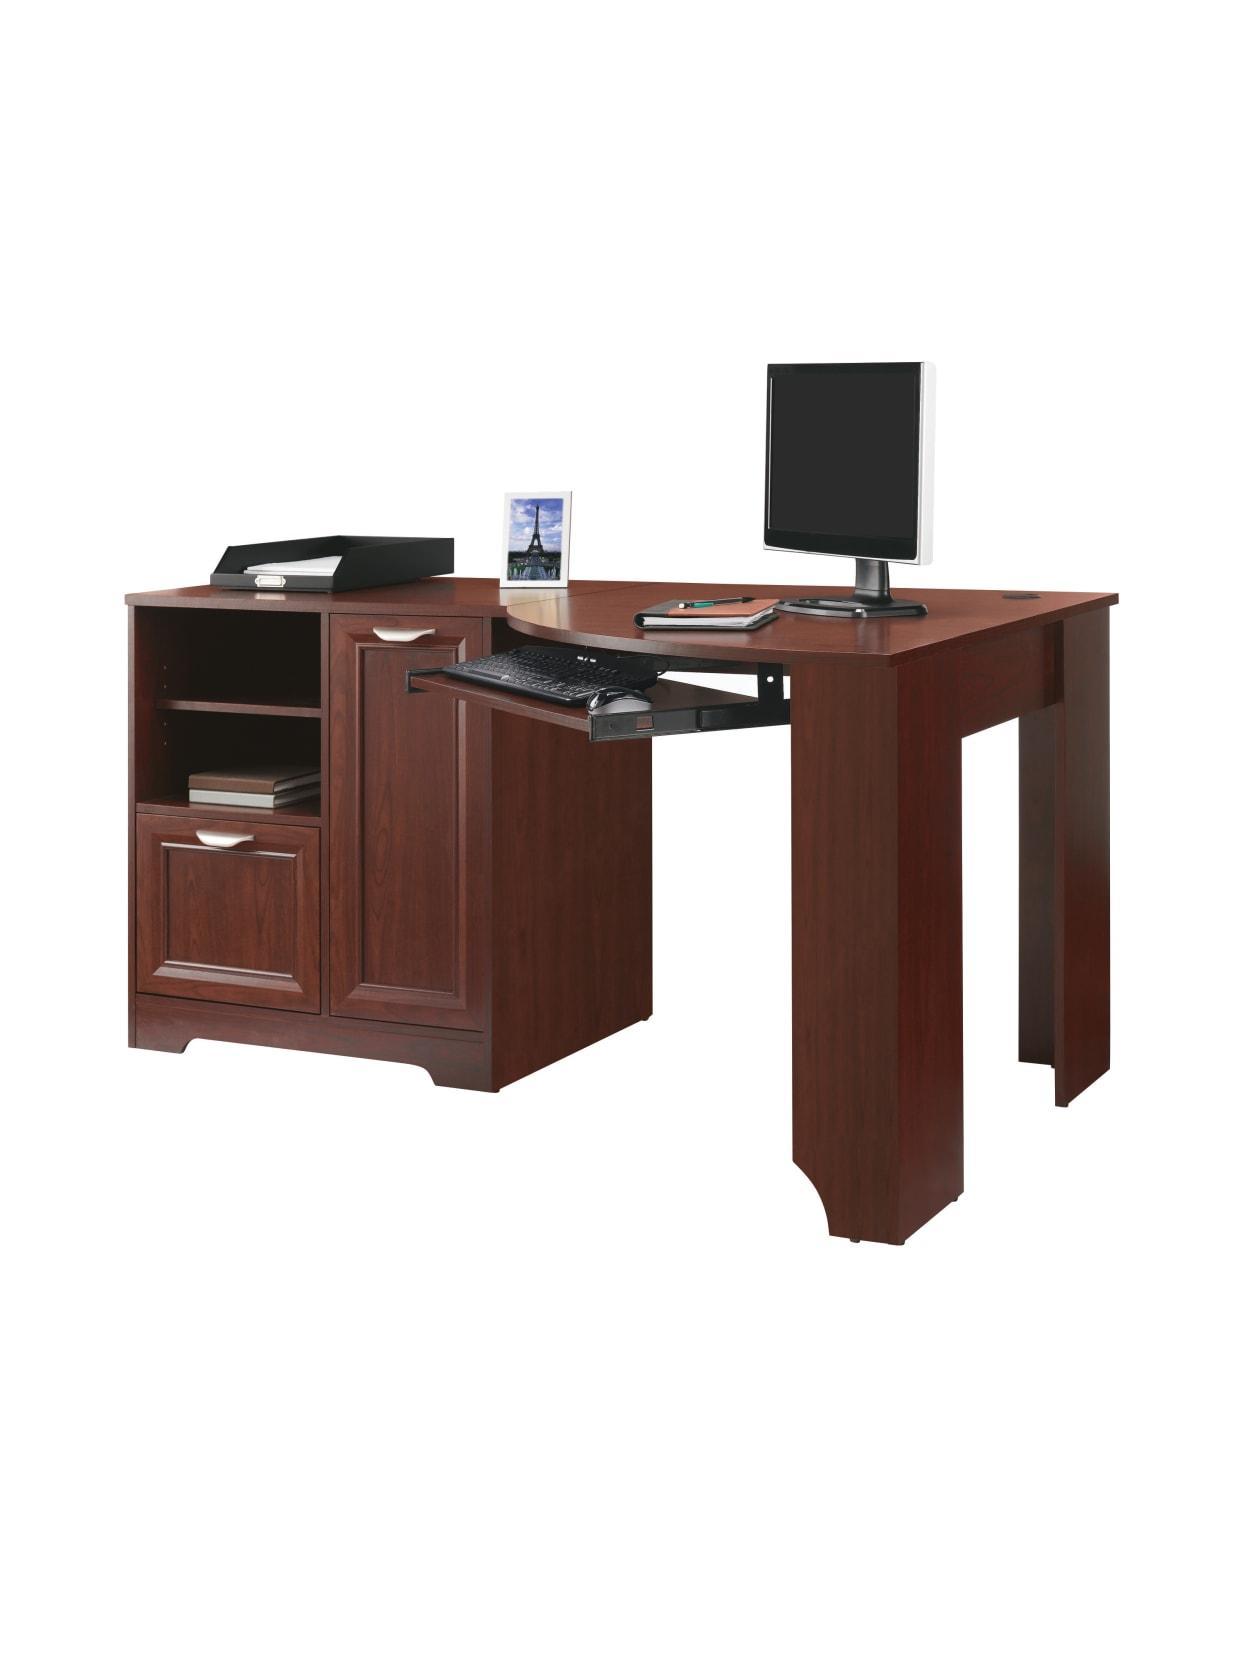 Realspace Magellan Corner Desk Cherry - Office Depot